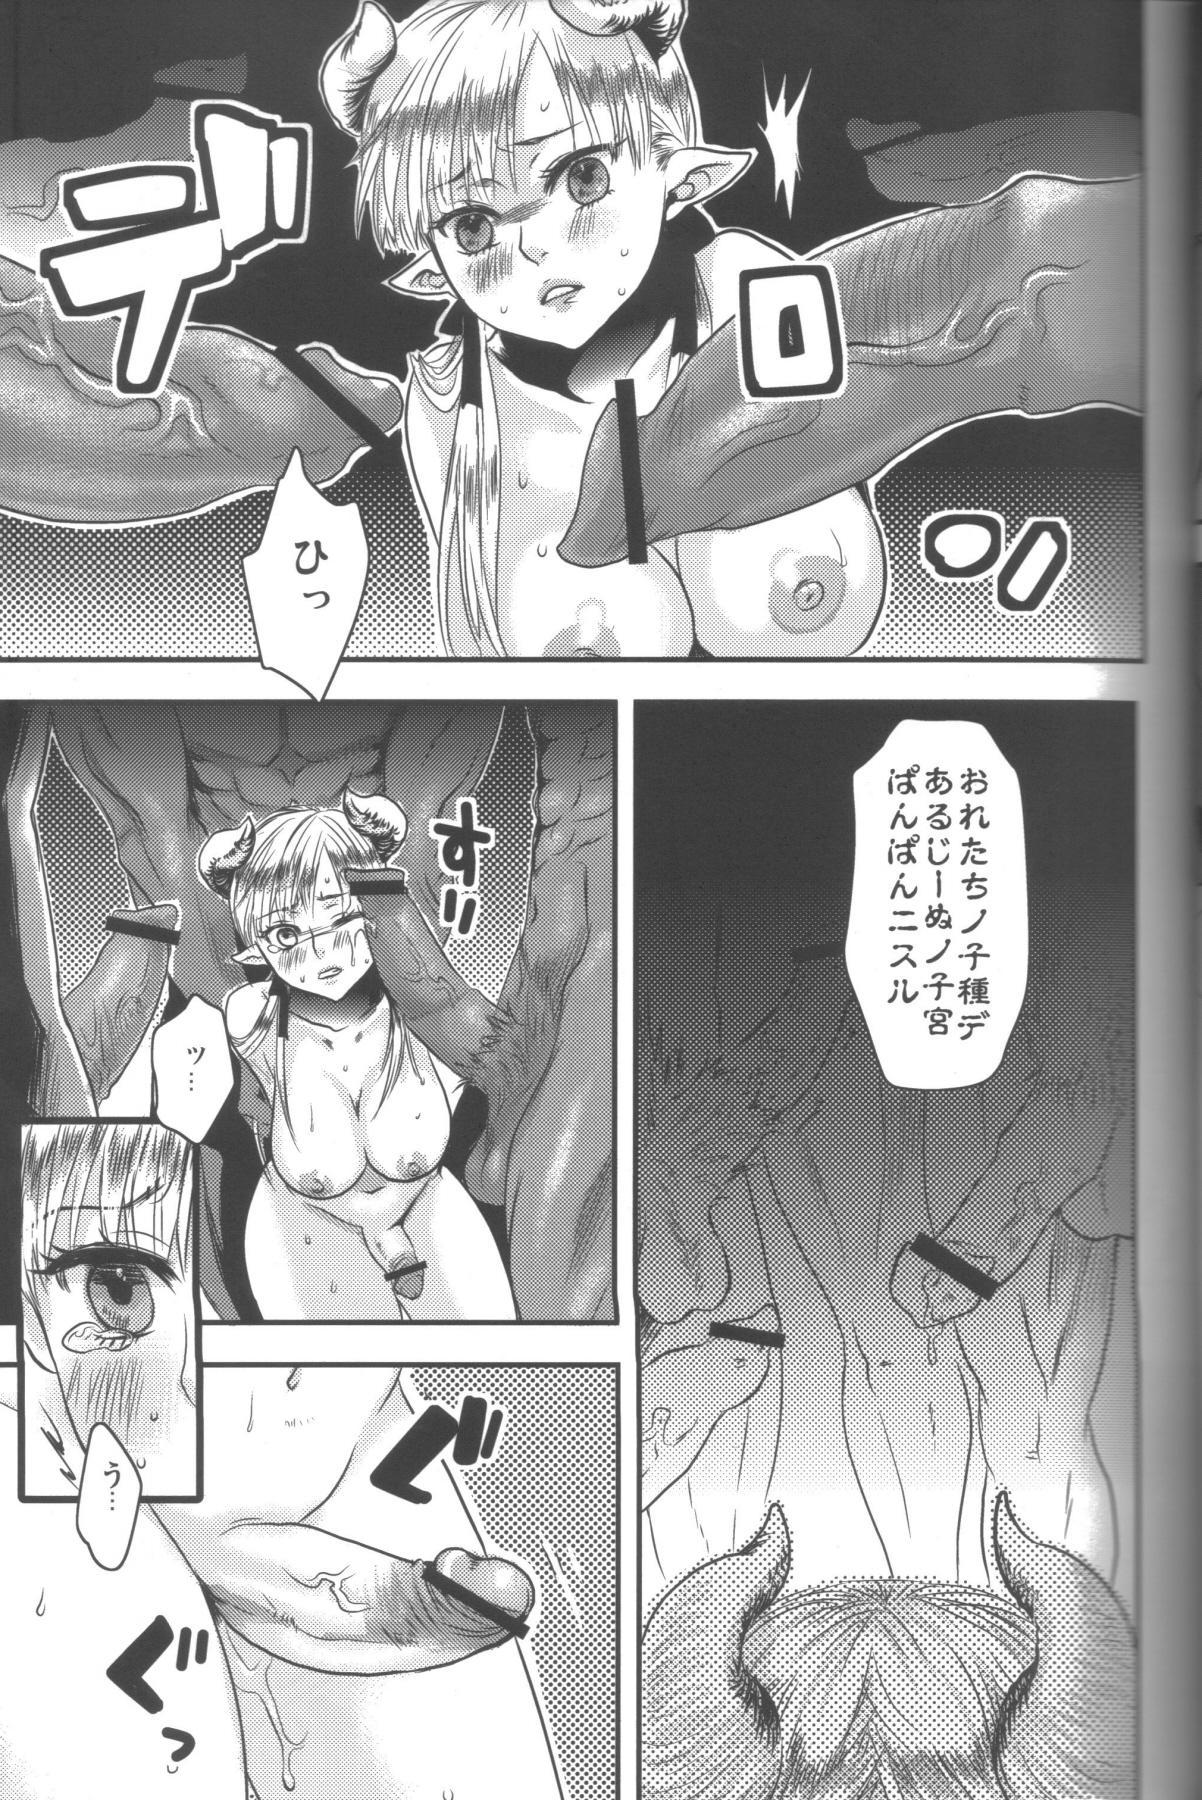 (C78) [Pish Lover (Amatake Akewo)] Hime Ouji-sama wa Harami-goro 11